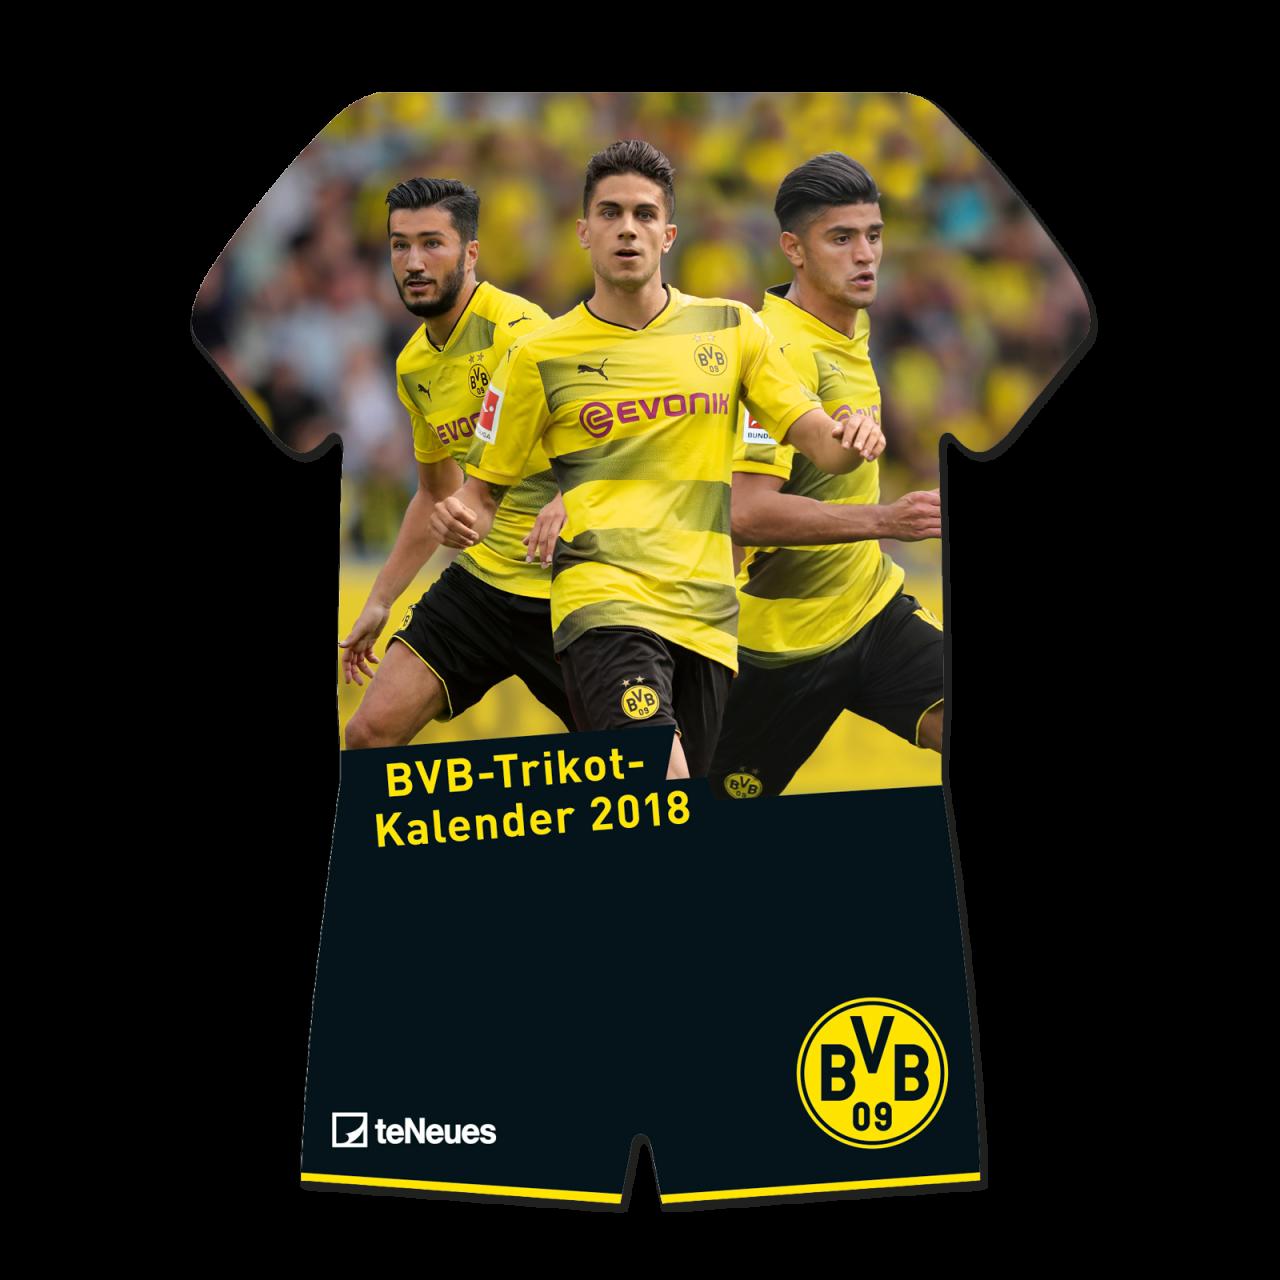 BVB-Trikotkalender 2018